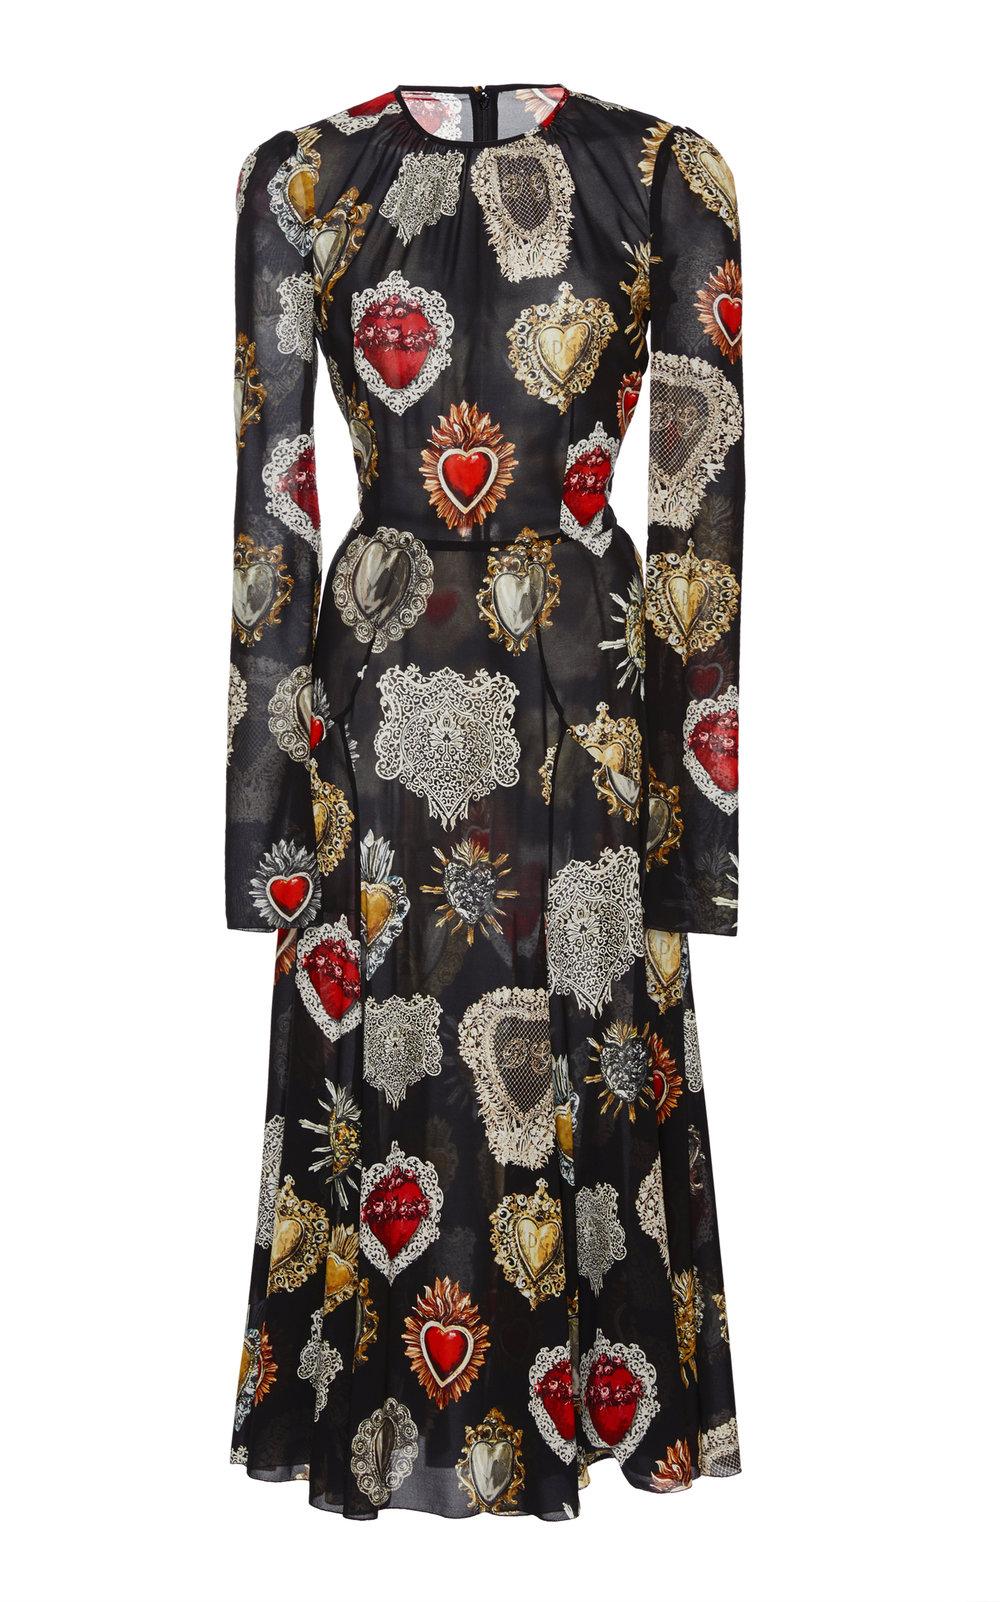 large_dolce-gabbana-black-white-printed-midi-dress.jpg